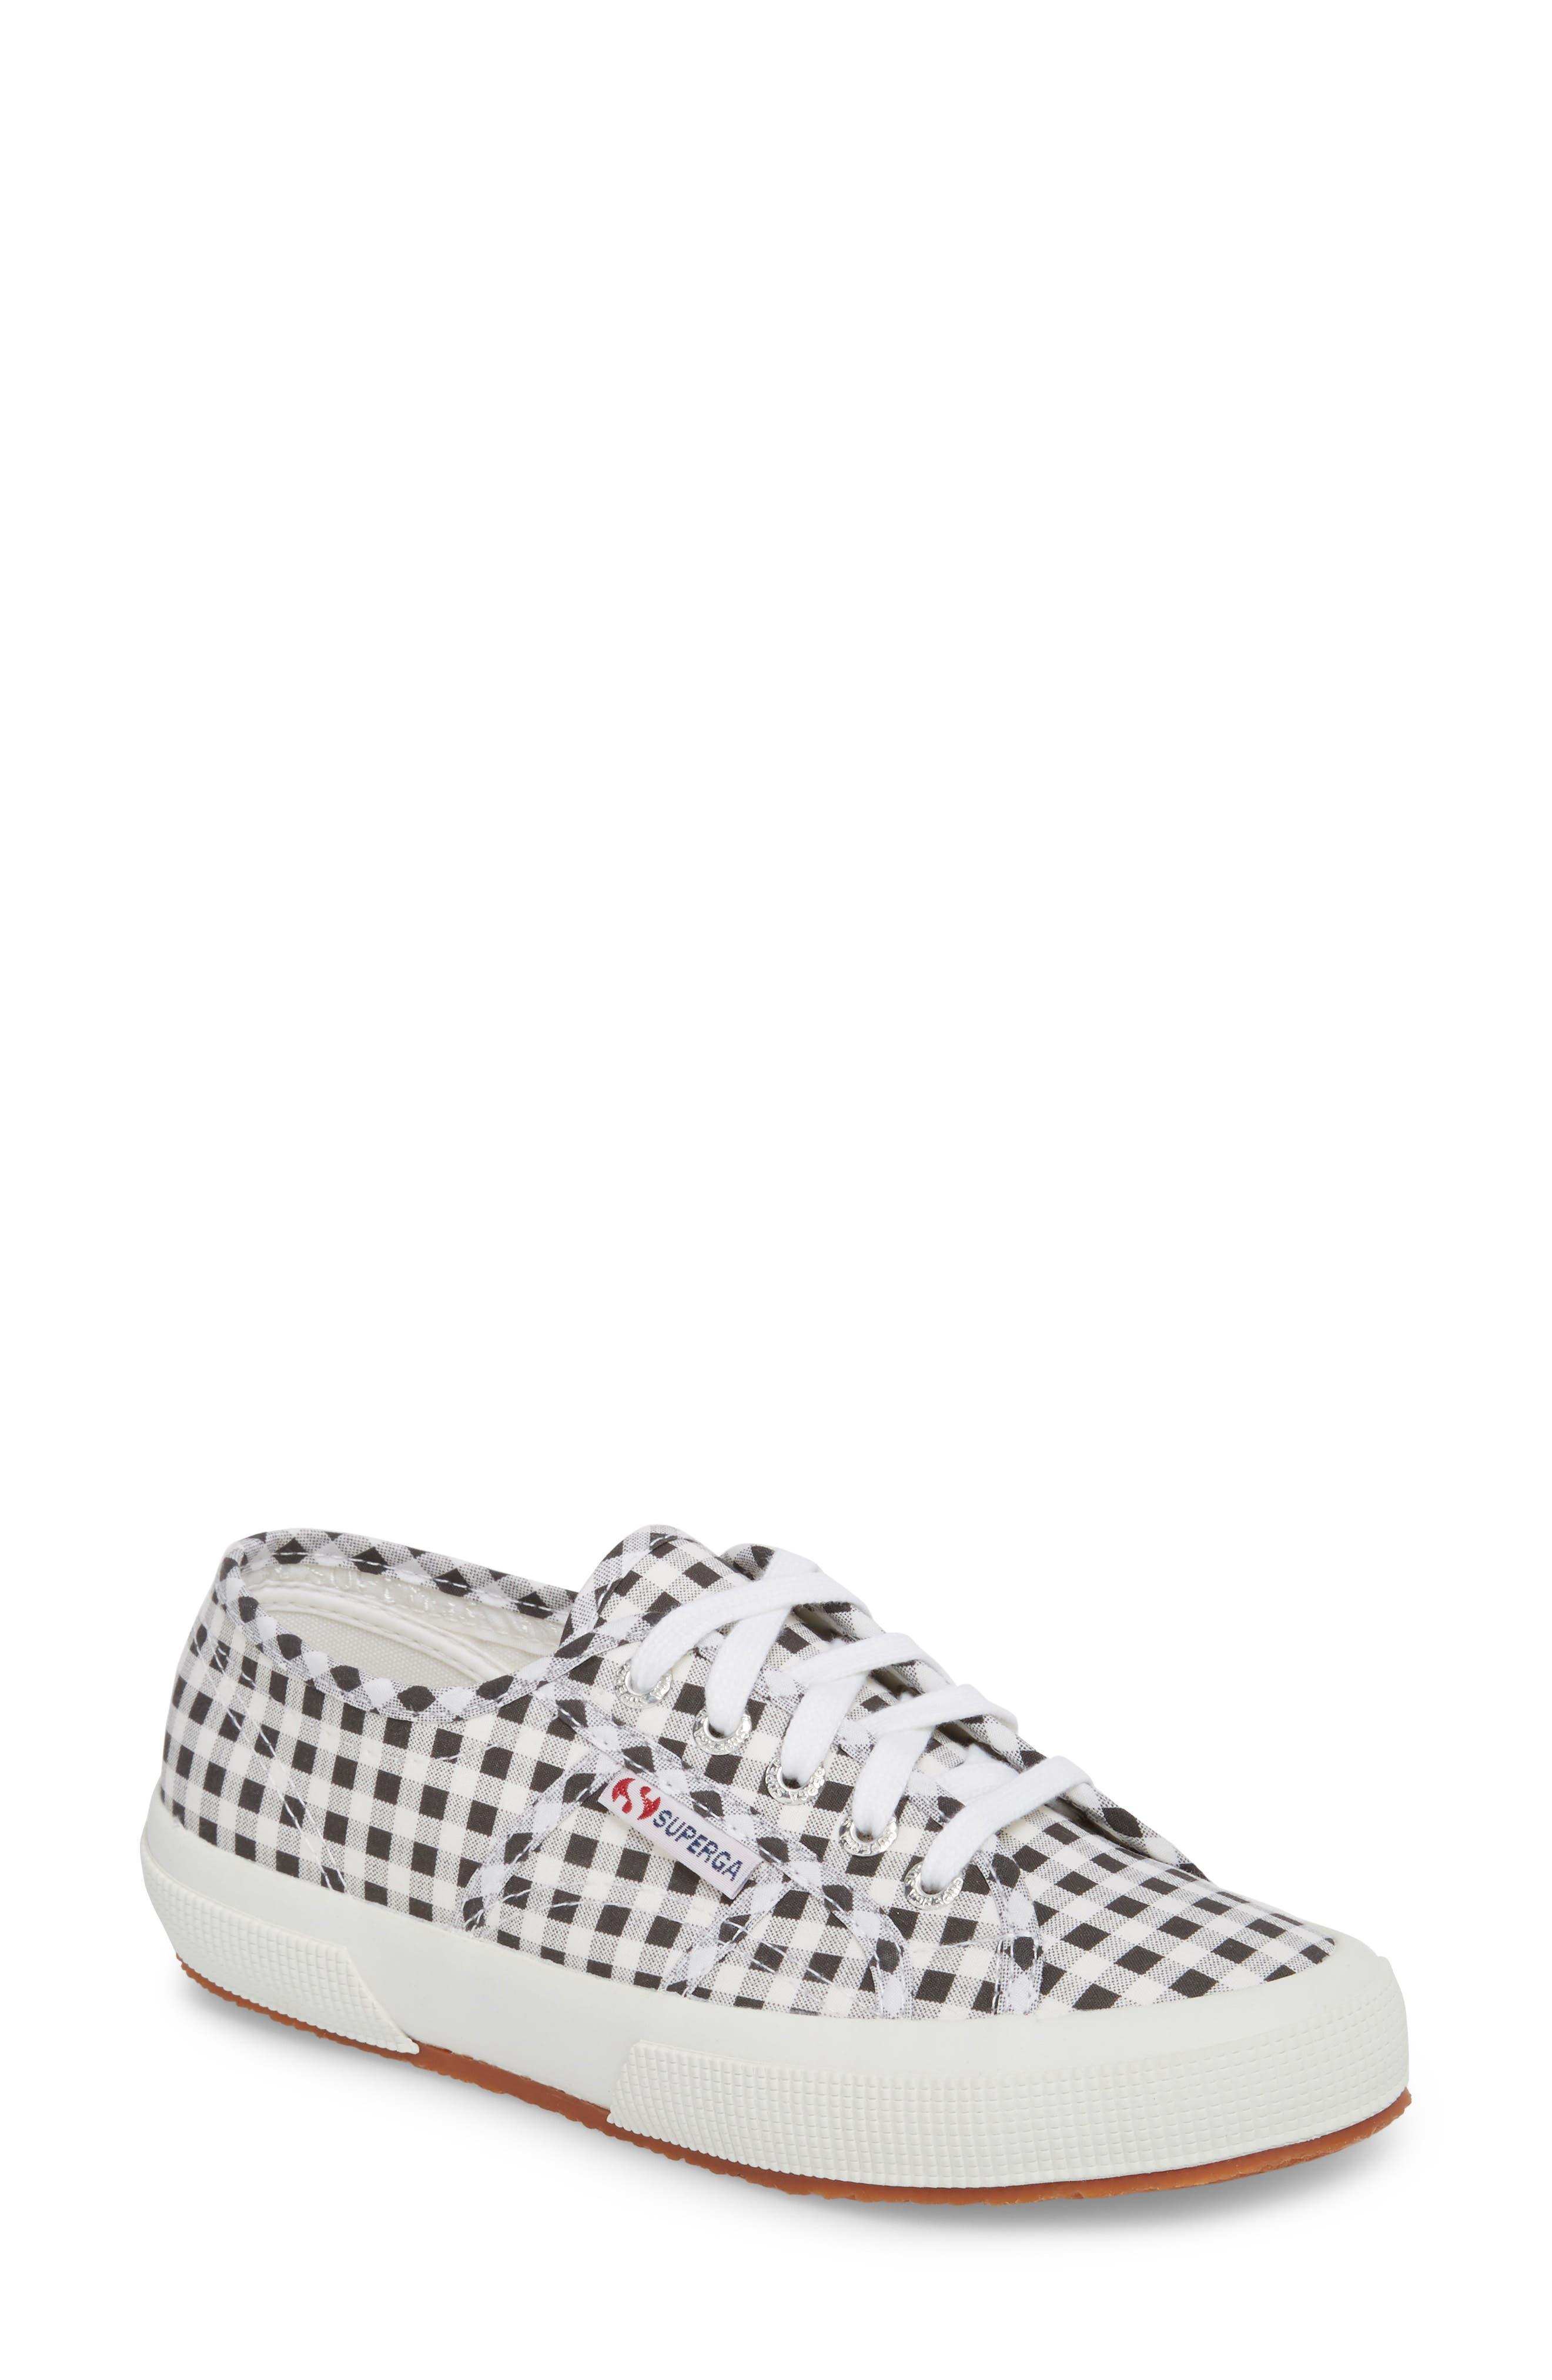 2750 Sneaker,                             Main thumbnail 1, color,                             BLACK